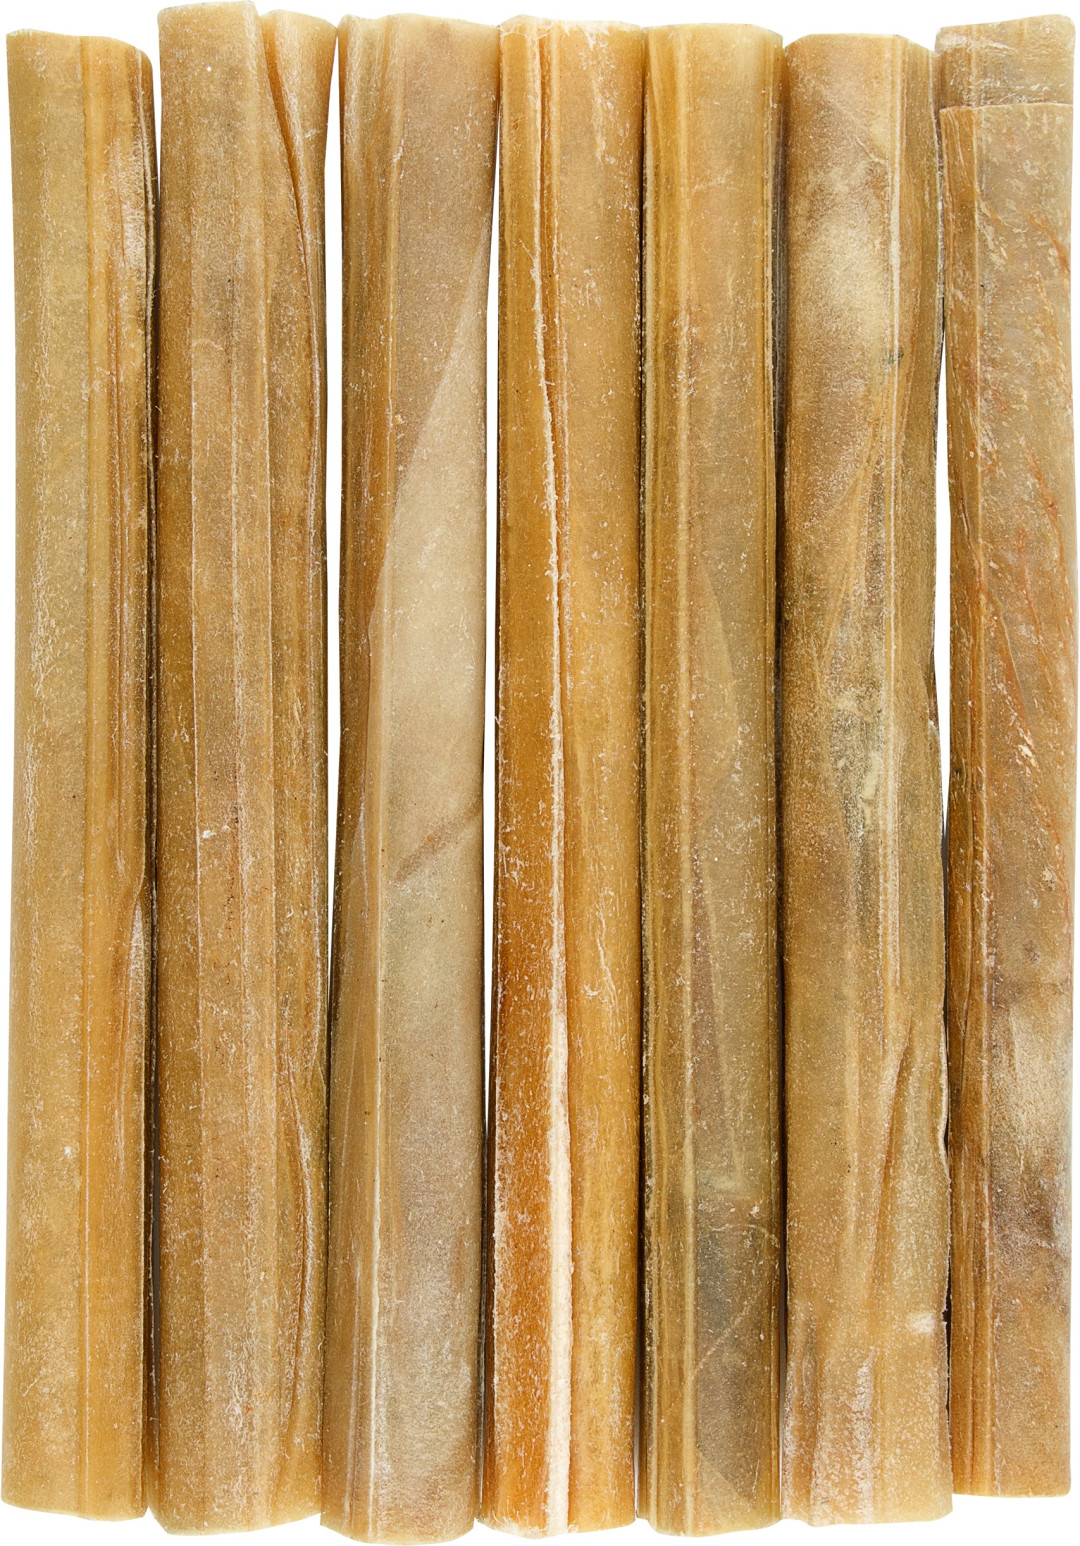 Geperste staven <br>12,5 cm (15 mm) <br>50 st